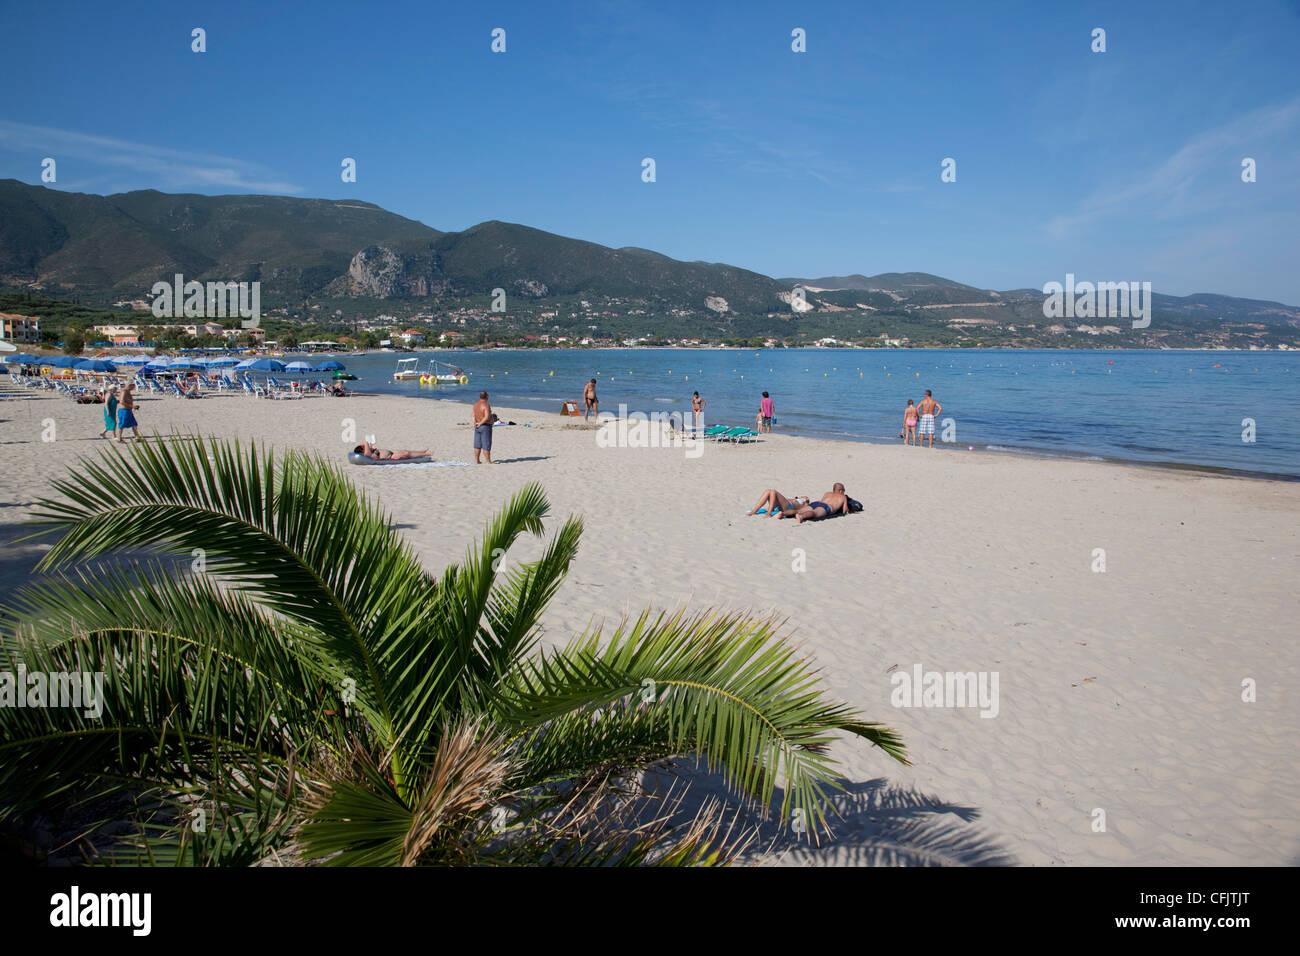 Beach scene, Alykanas, Zakynthos, Ionian Islands, Greek Islands, Greece, Europe - Stock Image